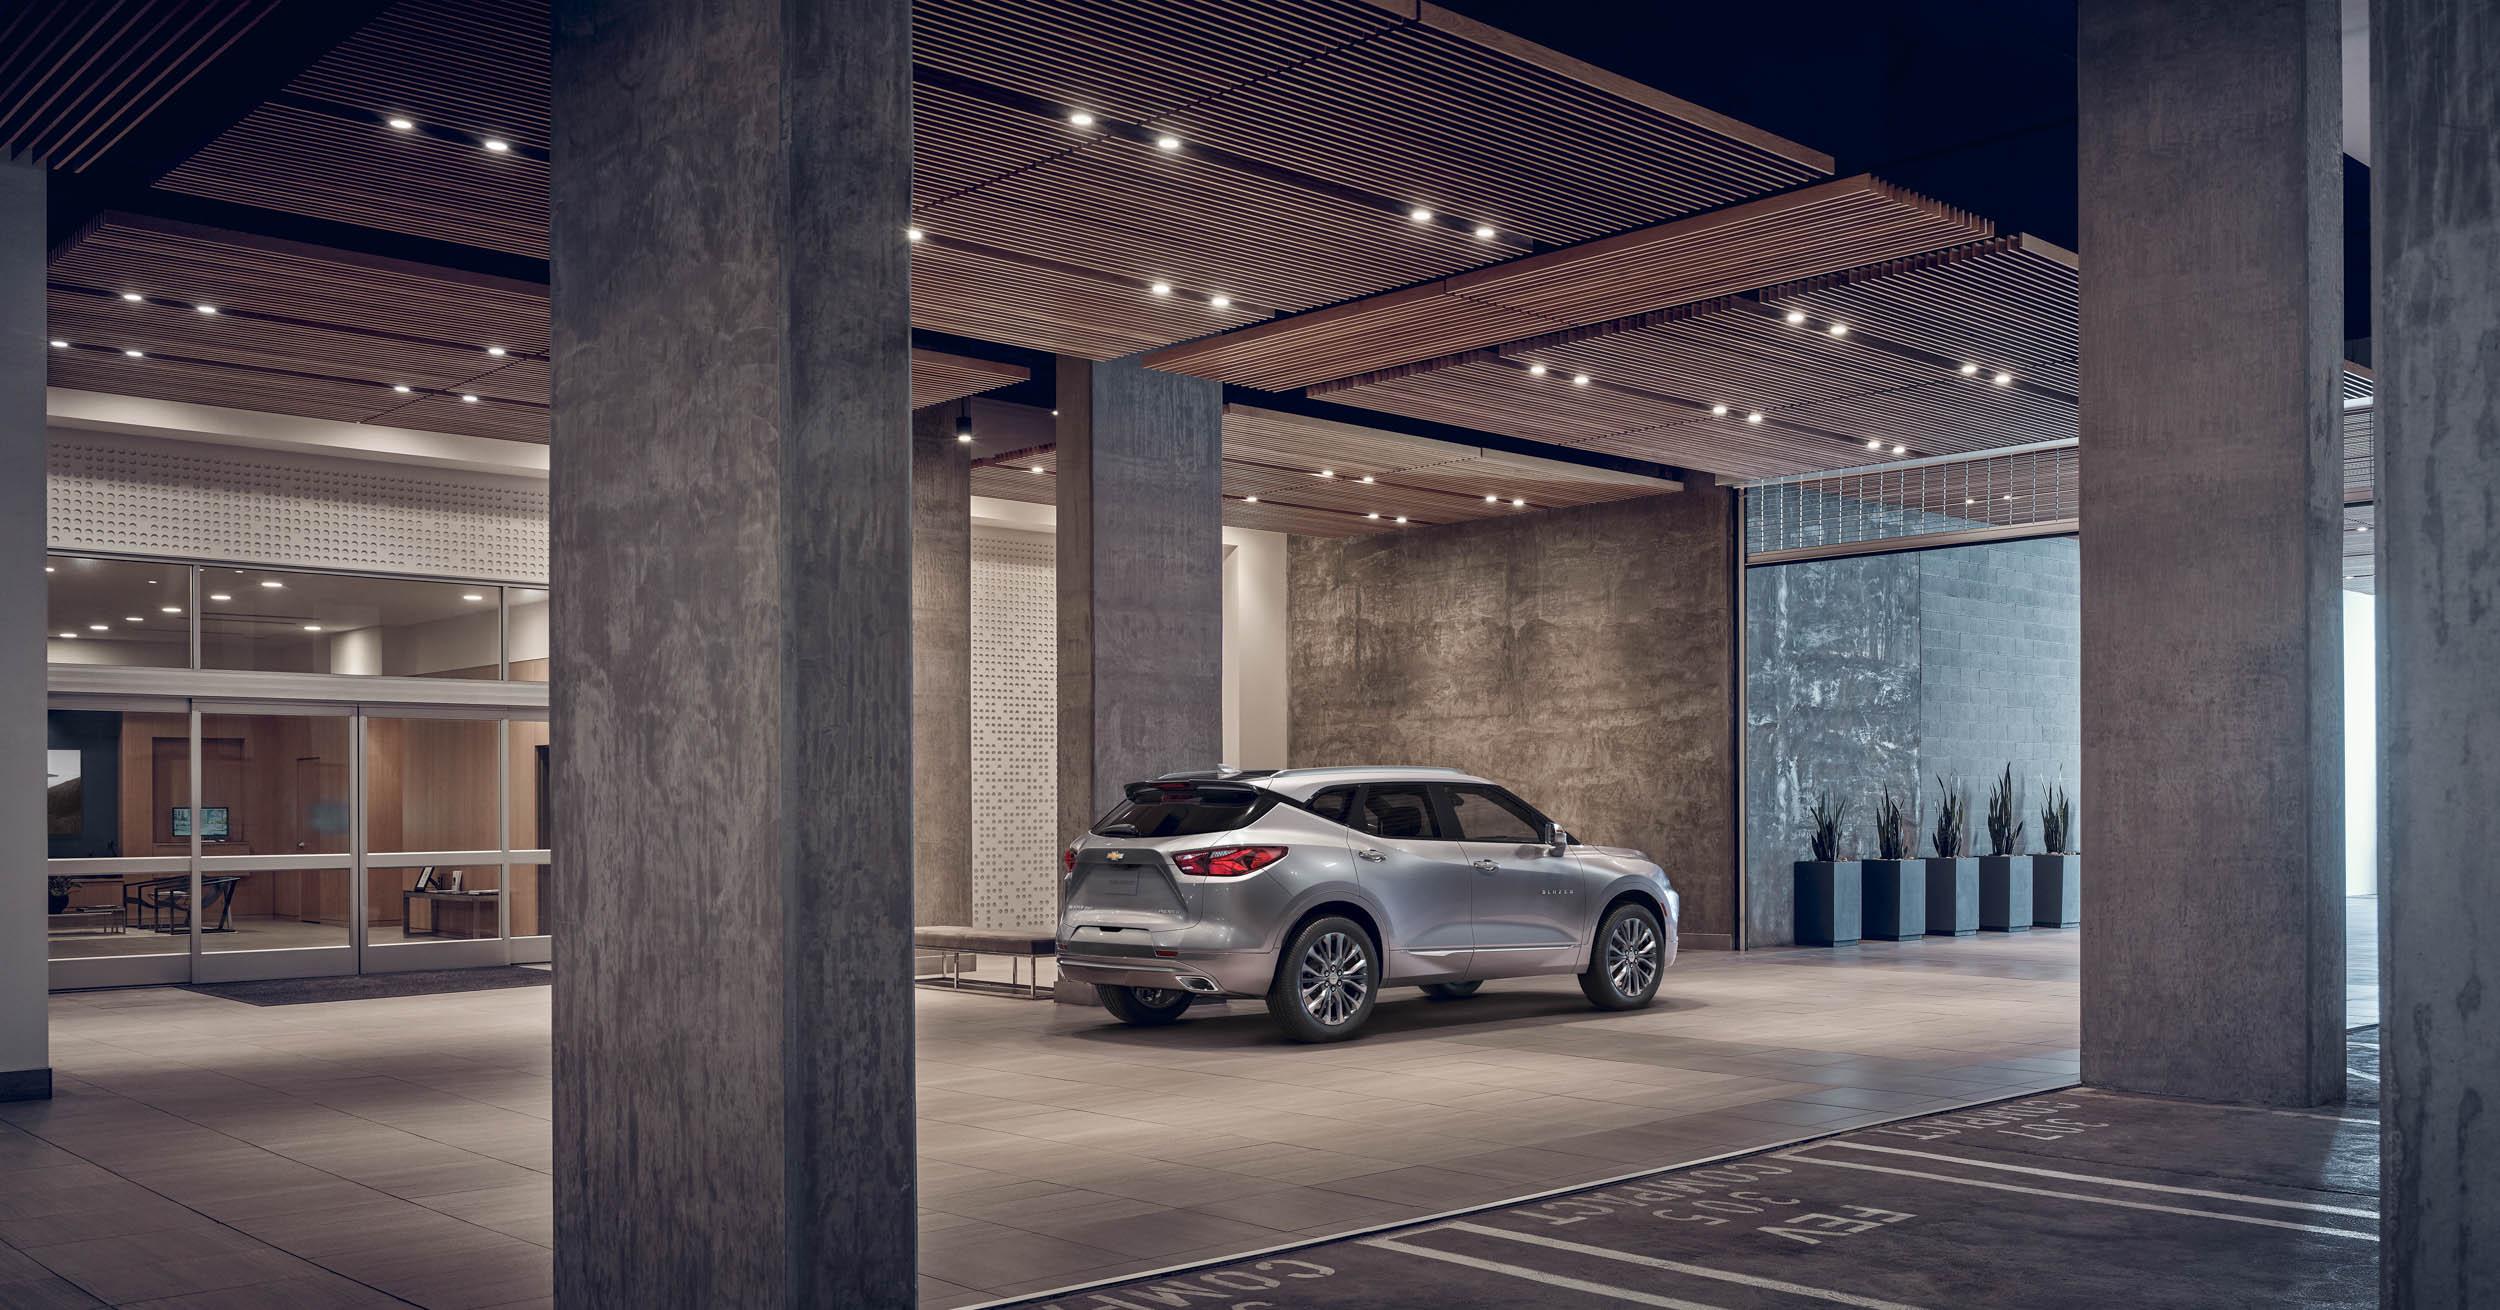 2019 Chevrolet Blazer rear 3/4 in a lobby